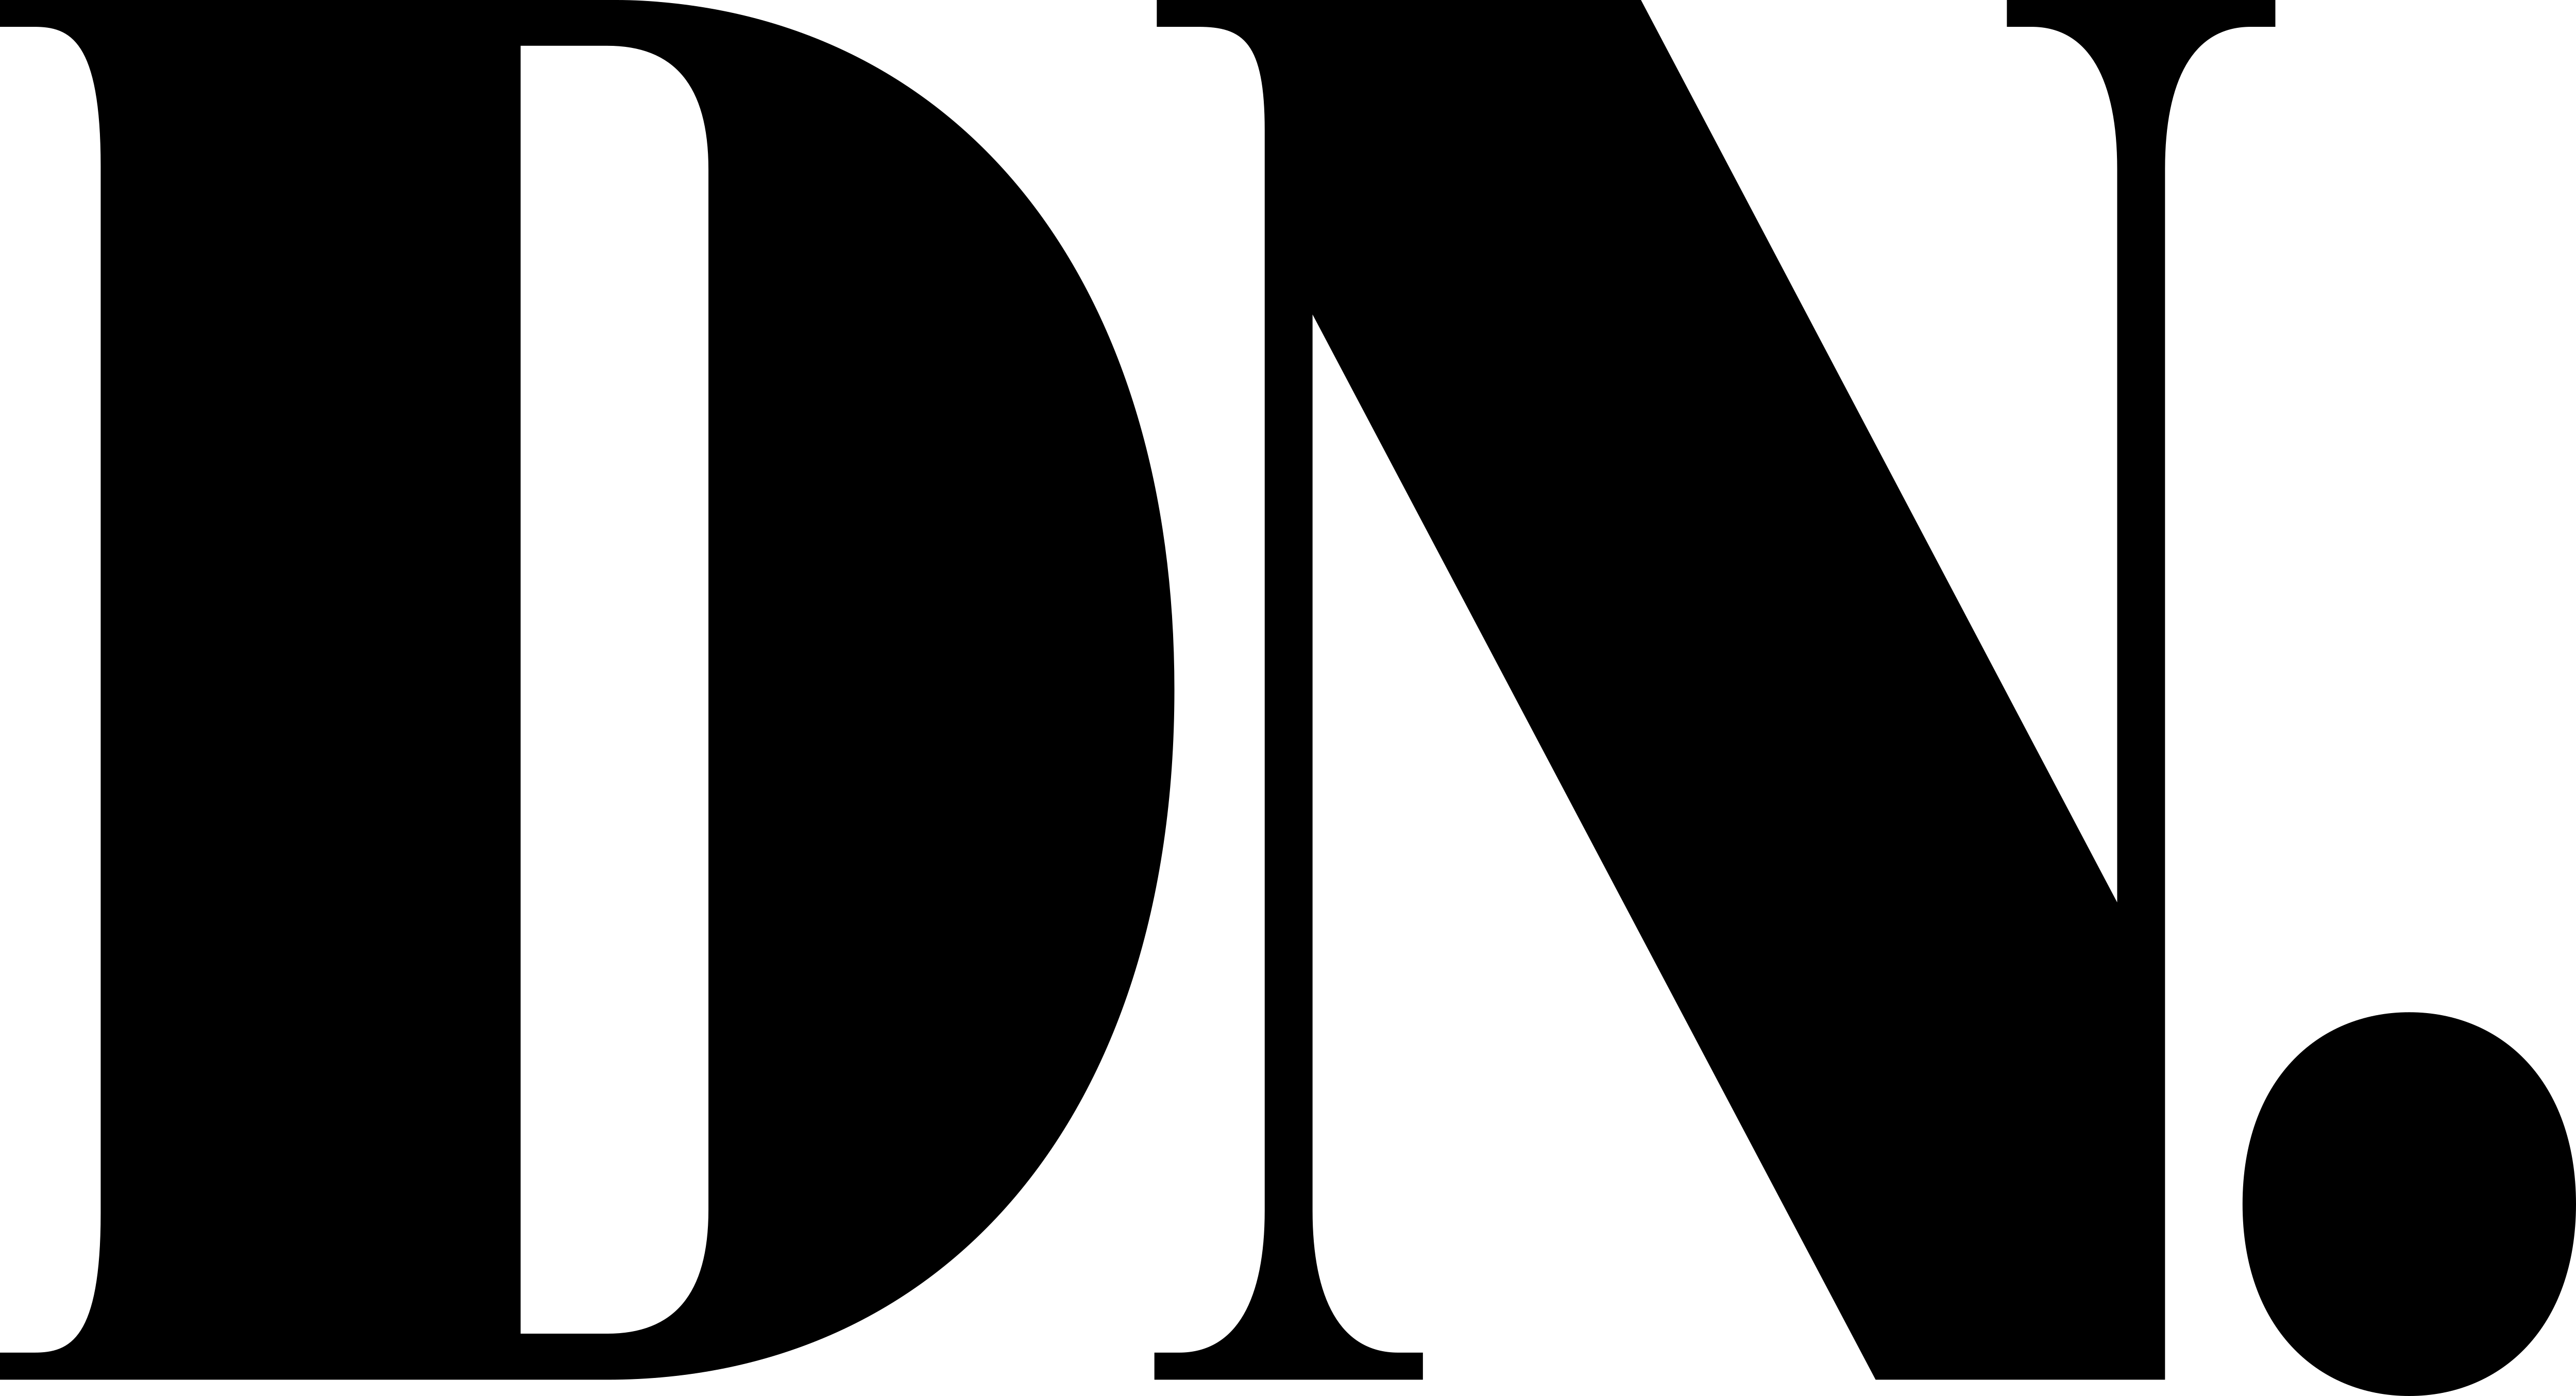 Dagens nyheters logo